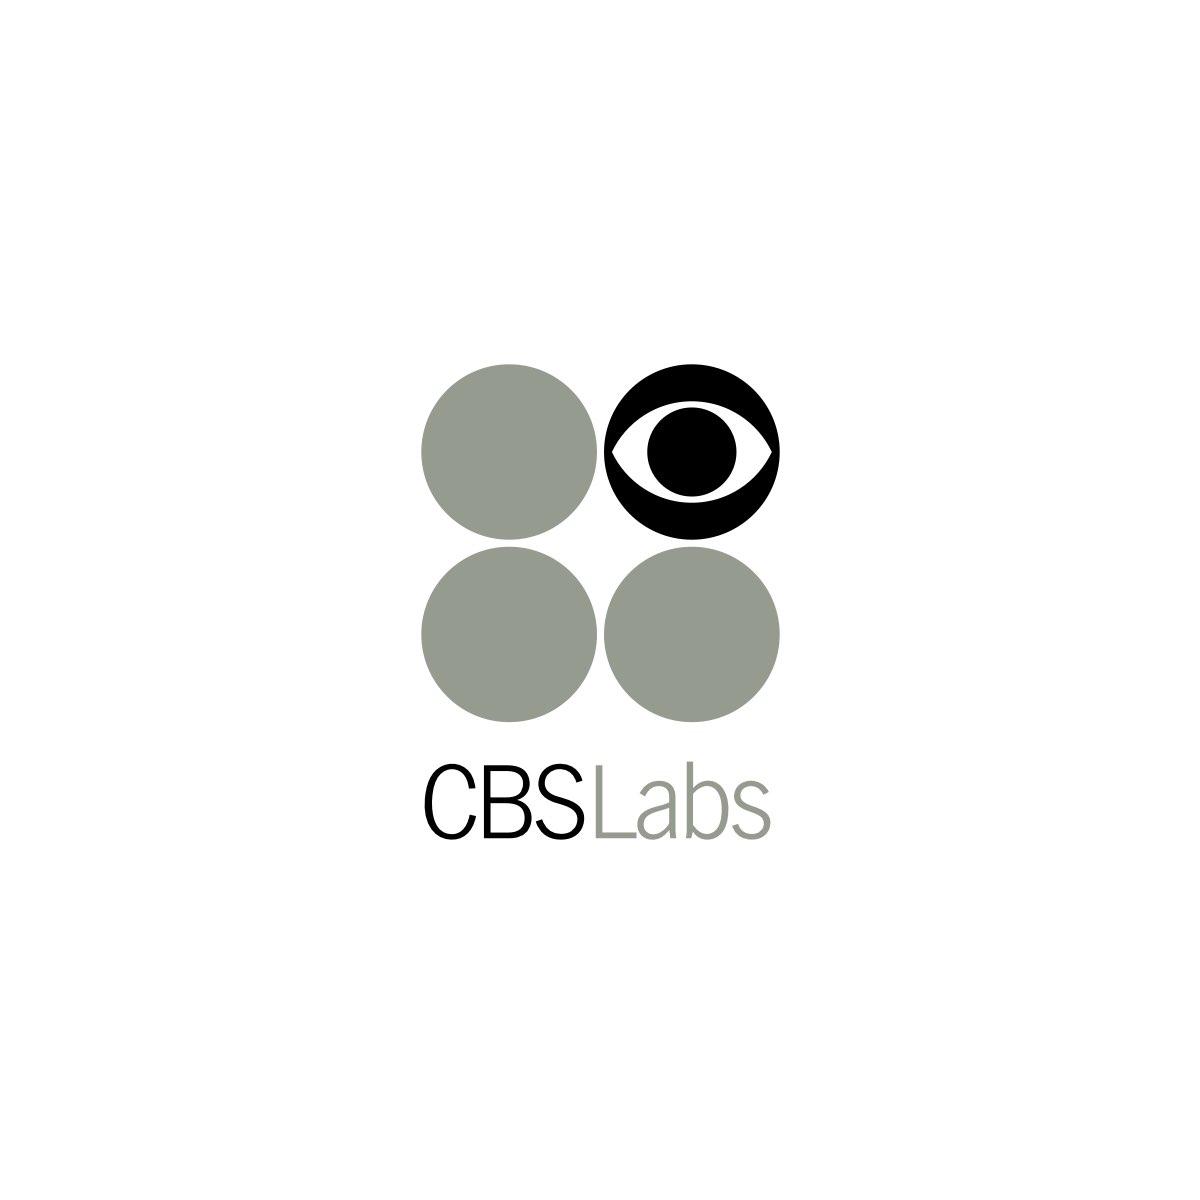 cbs_labs.003.jpeg